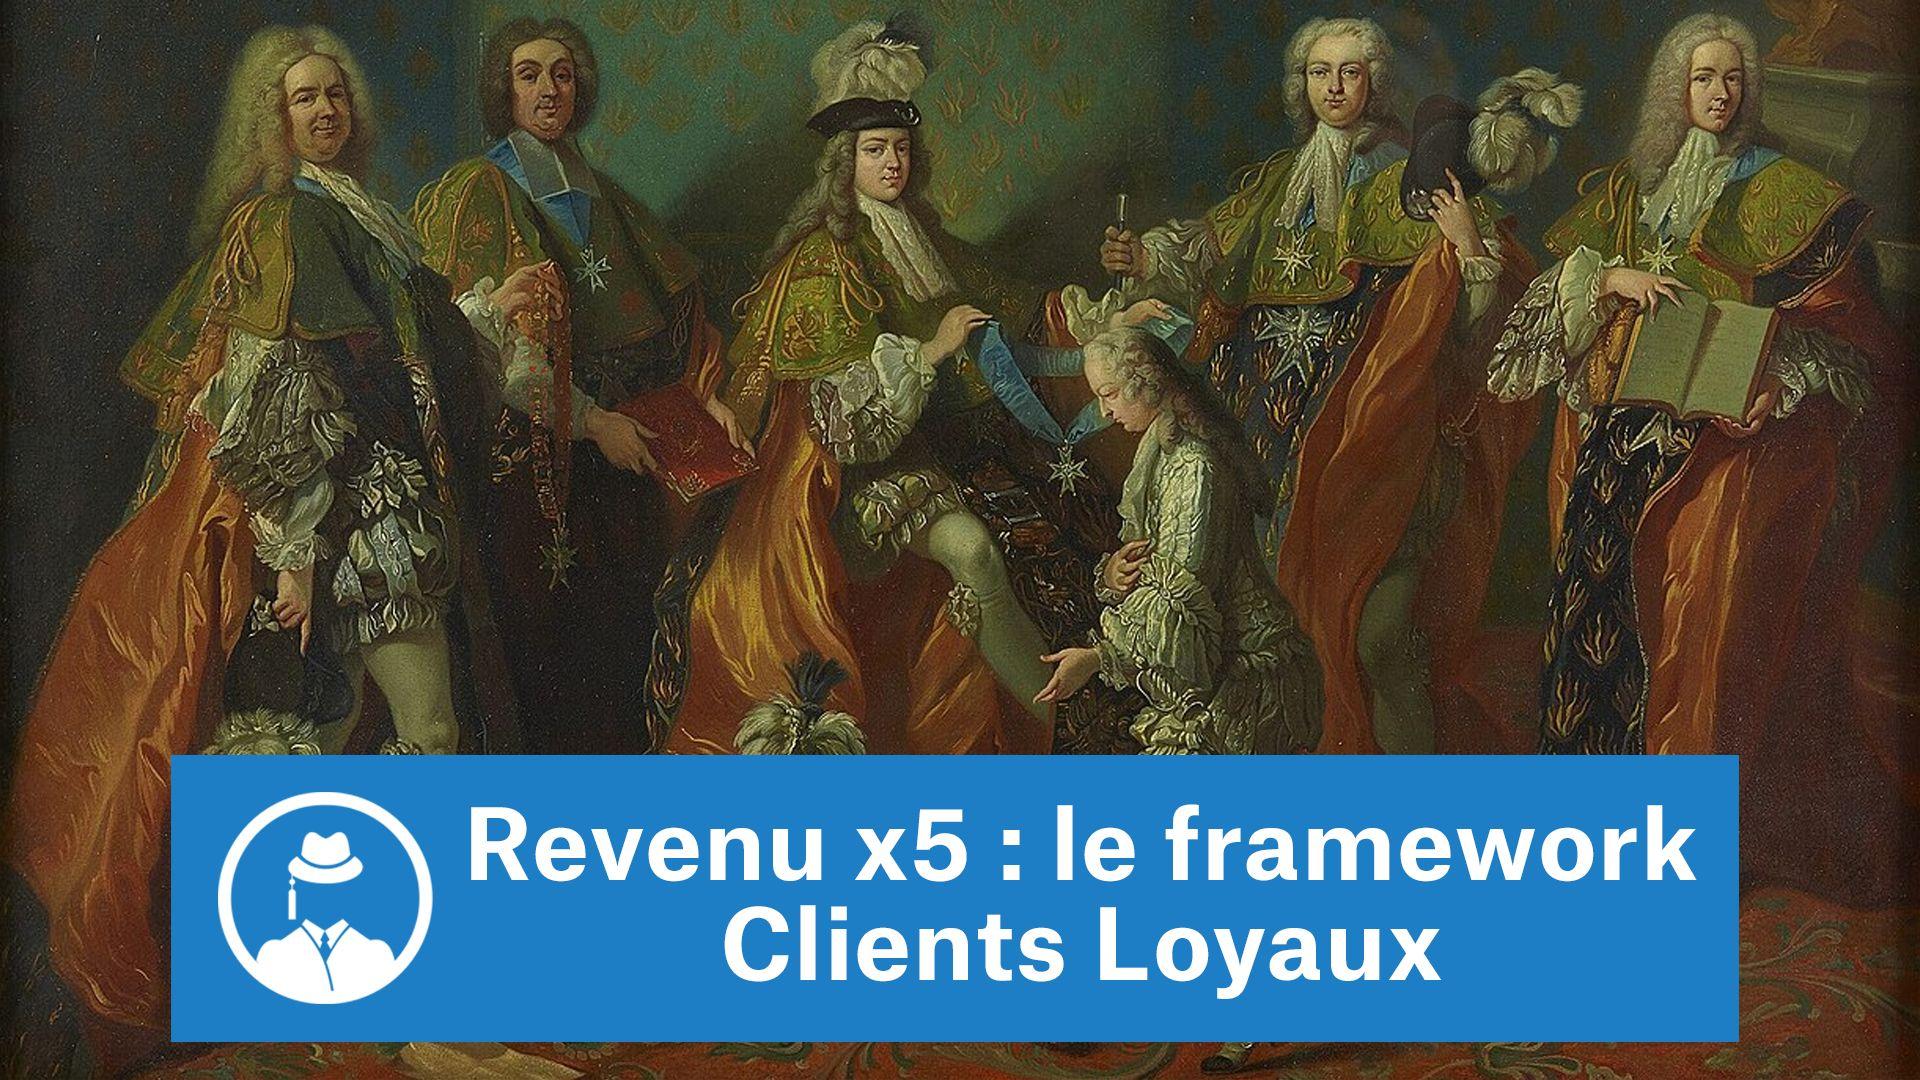 Revenu x5 : le framework Clients Loyaux #GrowthHacking #WebMarketing #FormationGrowthHacking #CentreDeFormationFrance #TunnelAARRR #AARRR #SocialMedia #CommunityManagement #SEO #MarketingDigital #SiteWeb